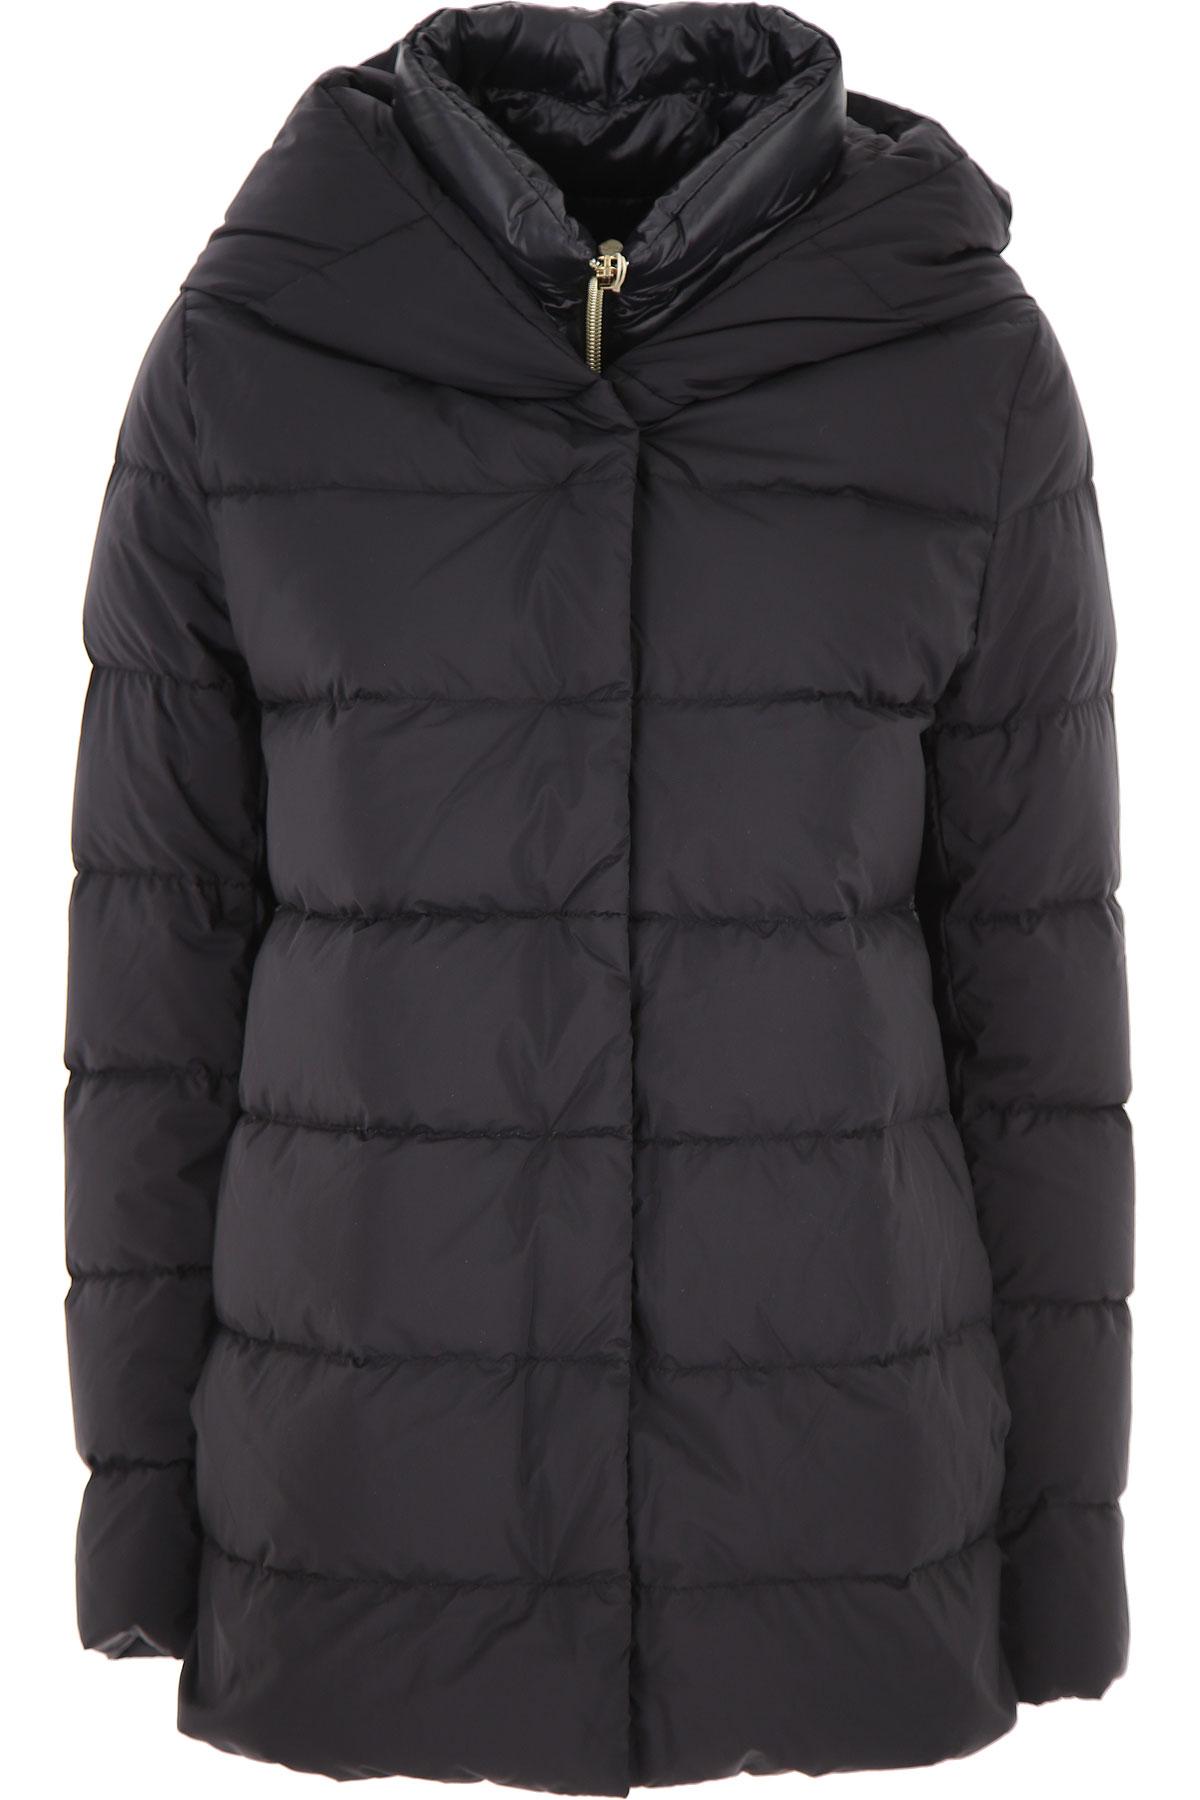 Herno Down Jacket for Women, Puffer Ski Jacket On Sale, Black, Down, 2019, 10 8